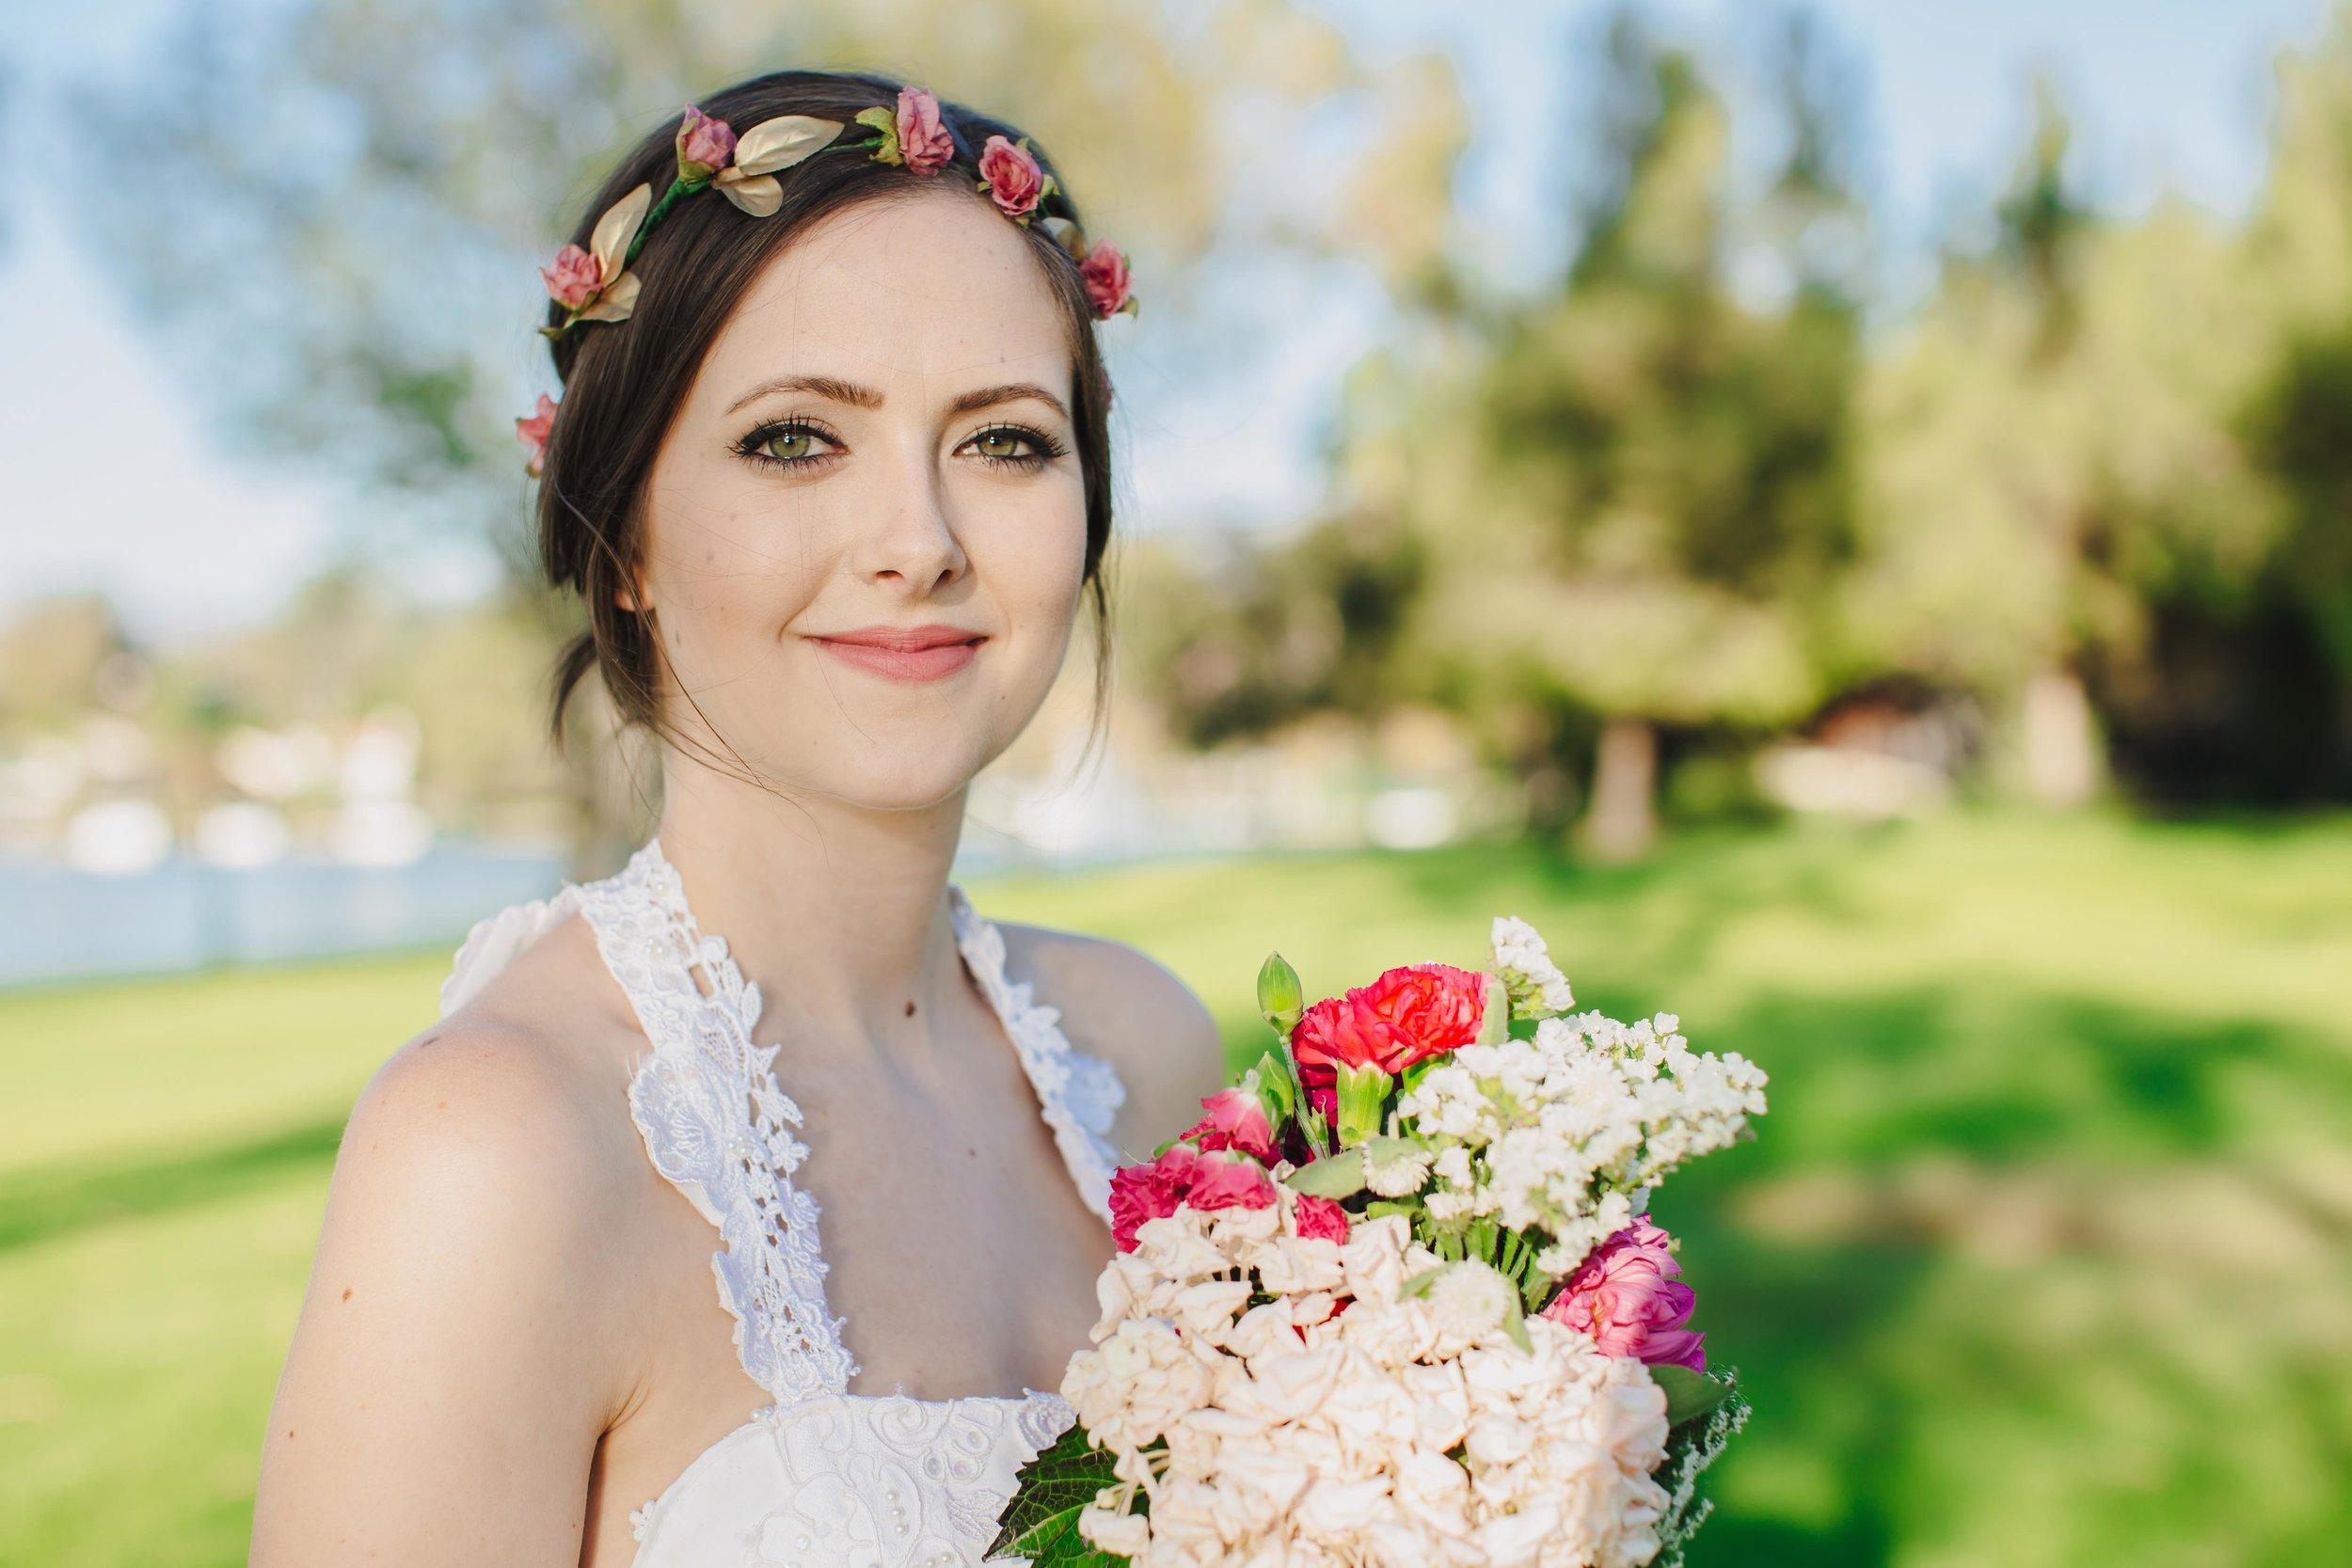 20141024-DePartee-Wedding-APavone-043-sm.jpg